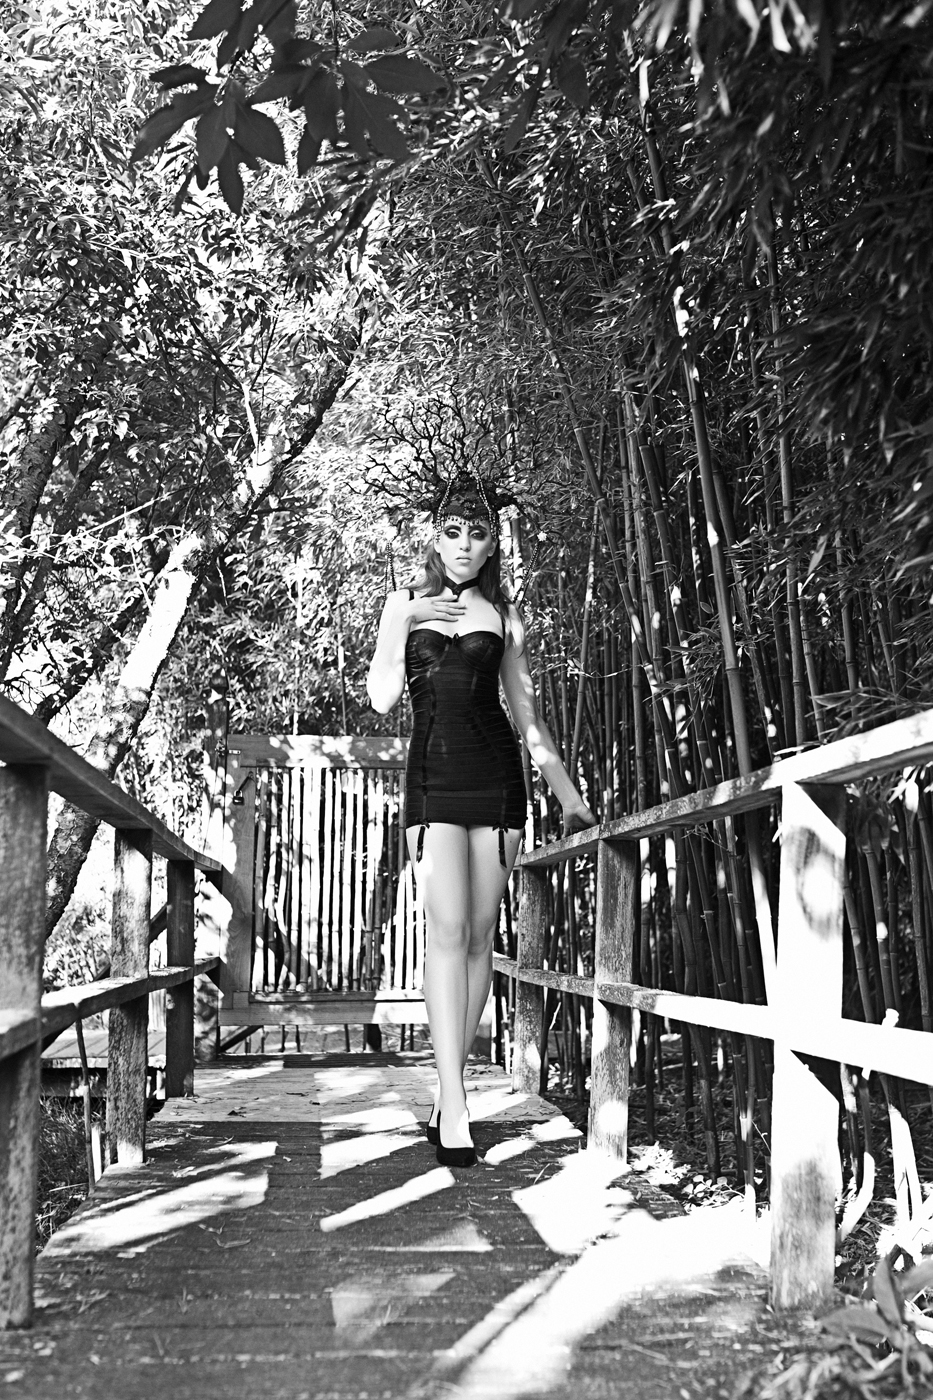 The Visitor Women  nudes nude model lions magazine lingerie fine art nudes fashion model editorial body artwork art   // lionsmag.com - premium nude photography magazine